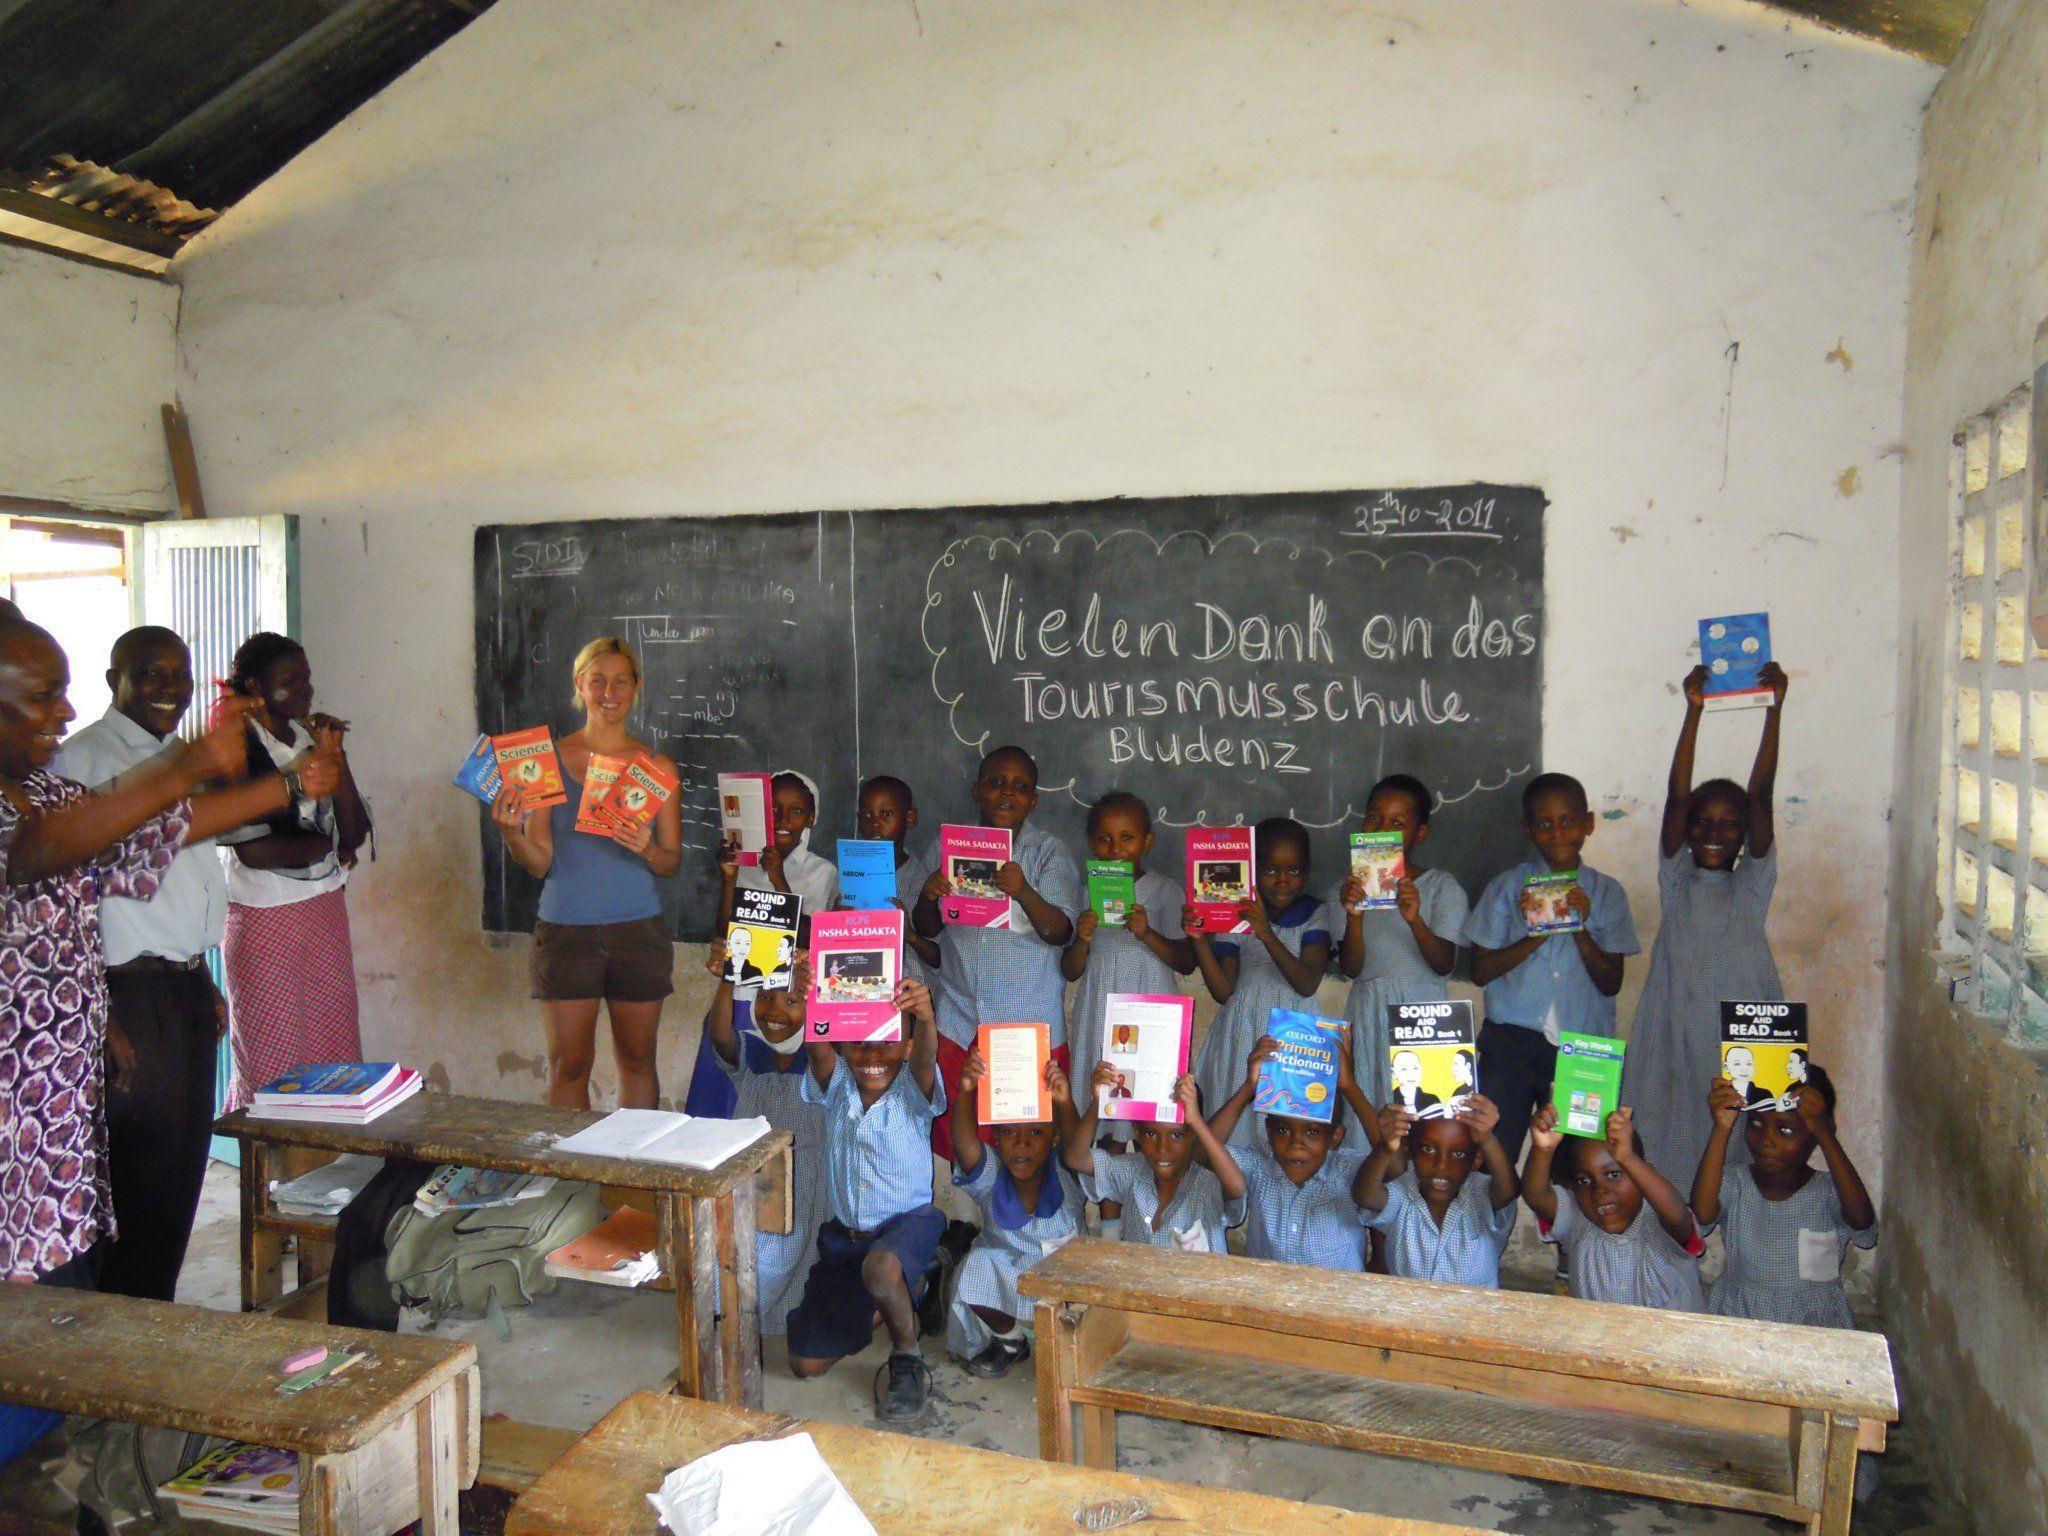 Help Keniakinder